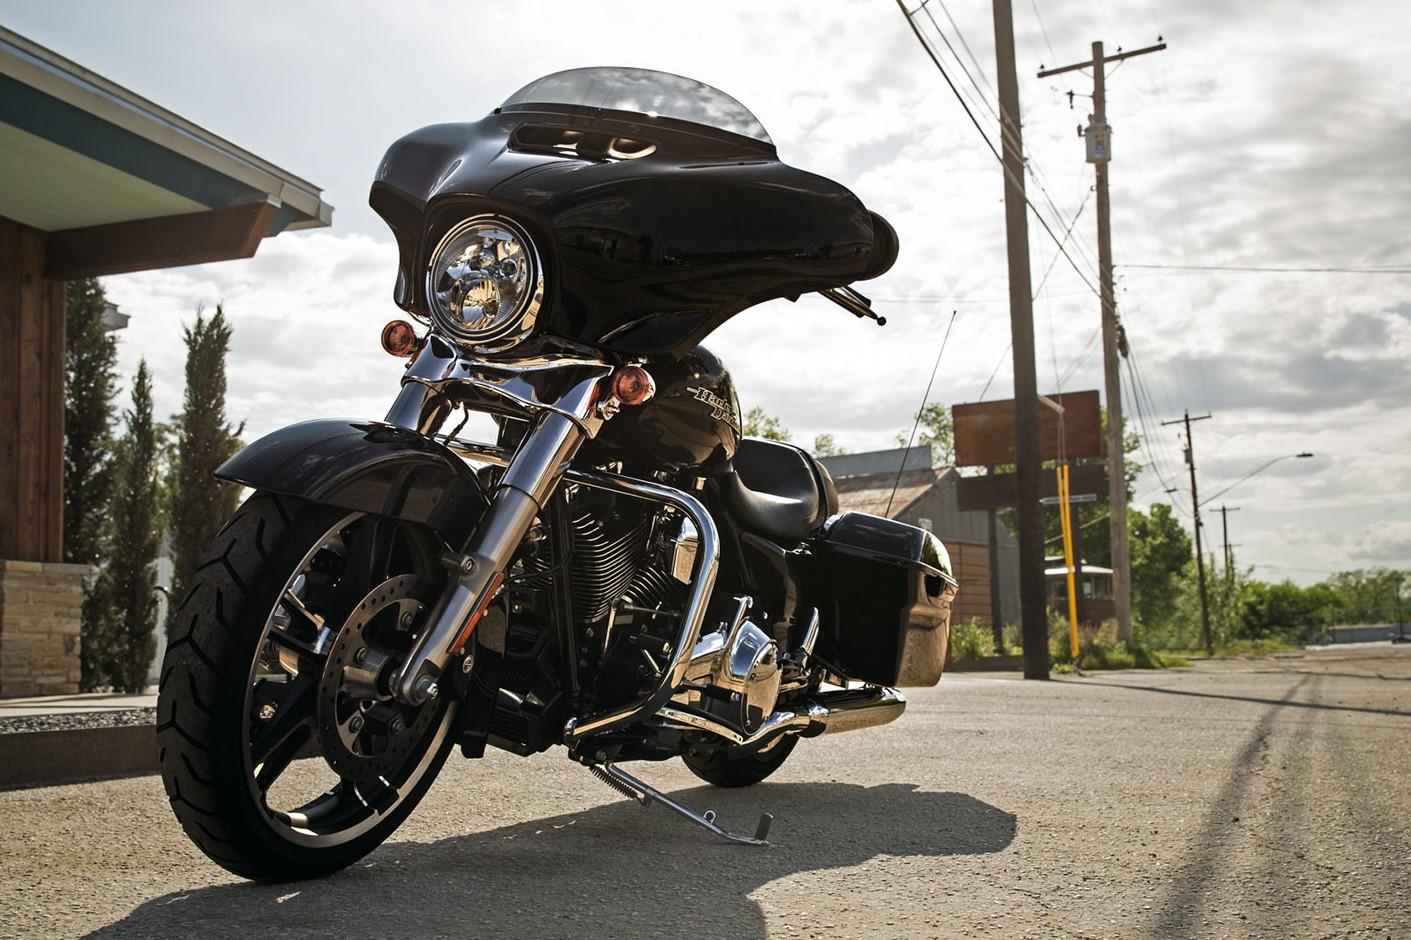 Harley-Davidson Touring Workshop Service Repair Manual 2016 on